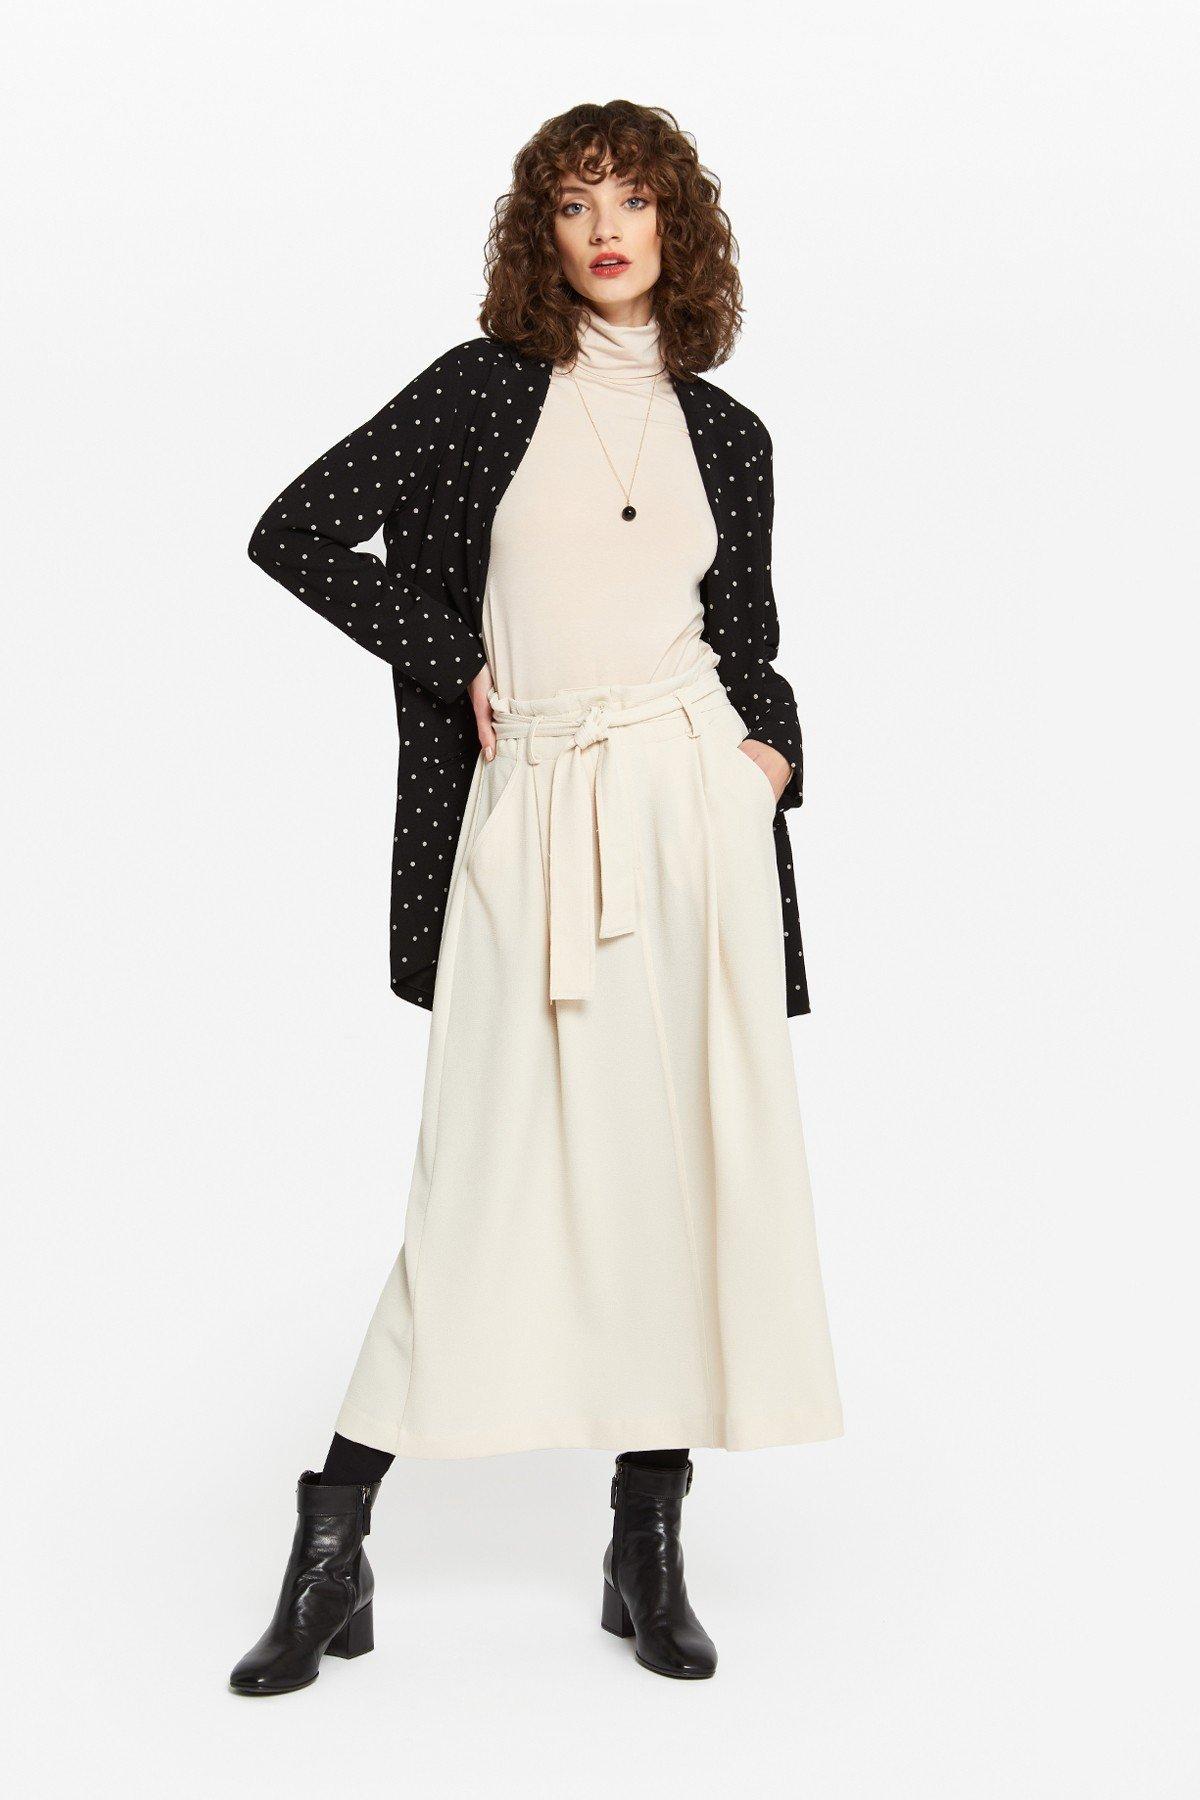 Oversized skirt with sash